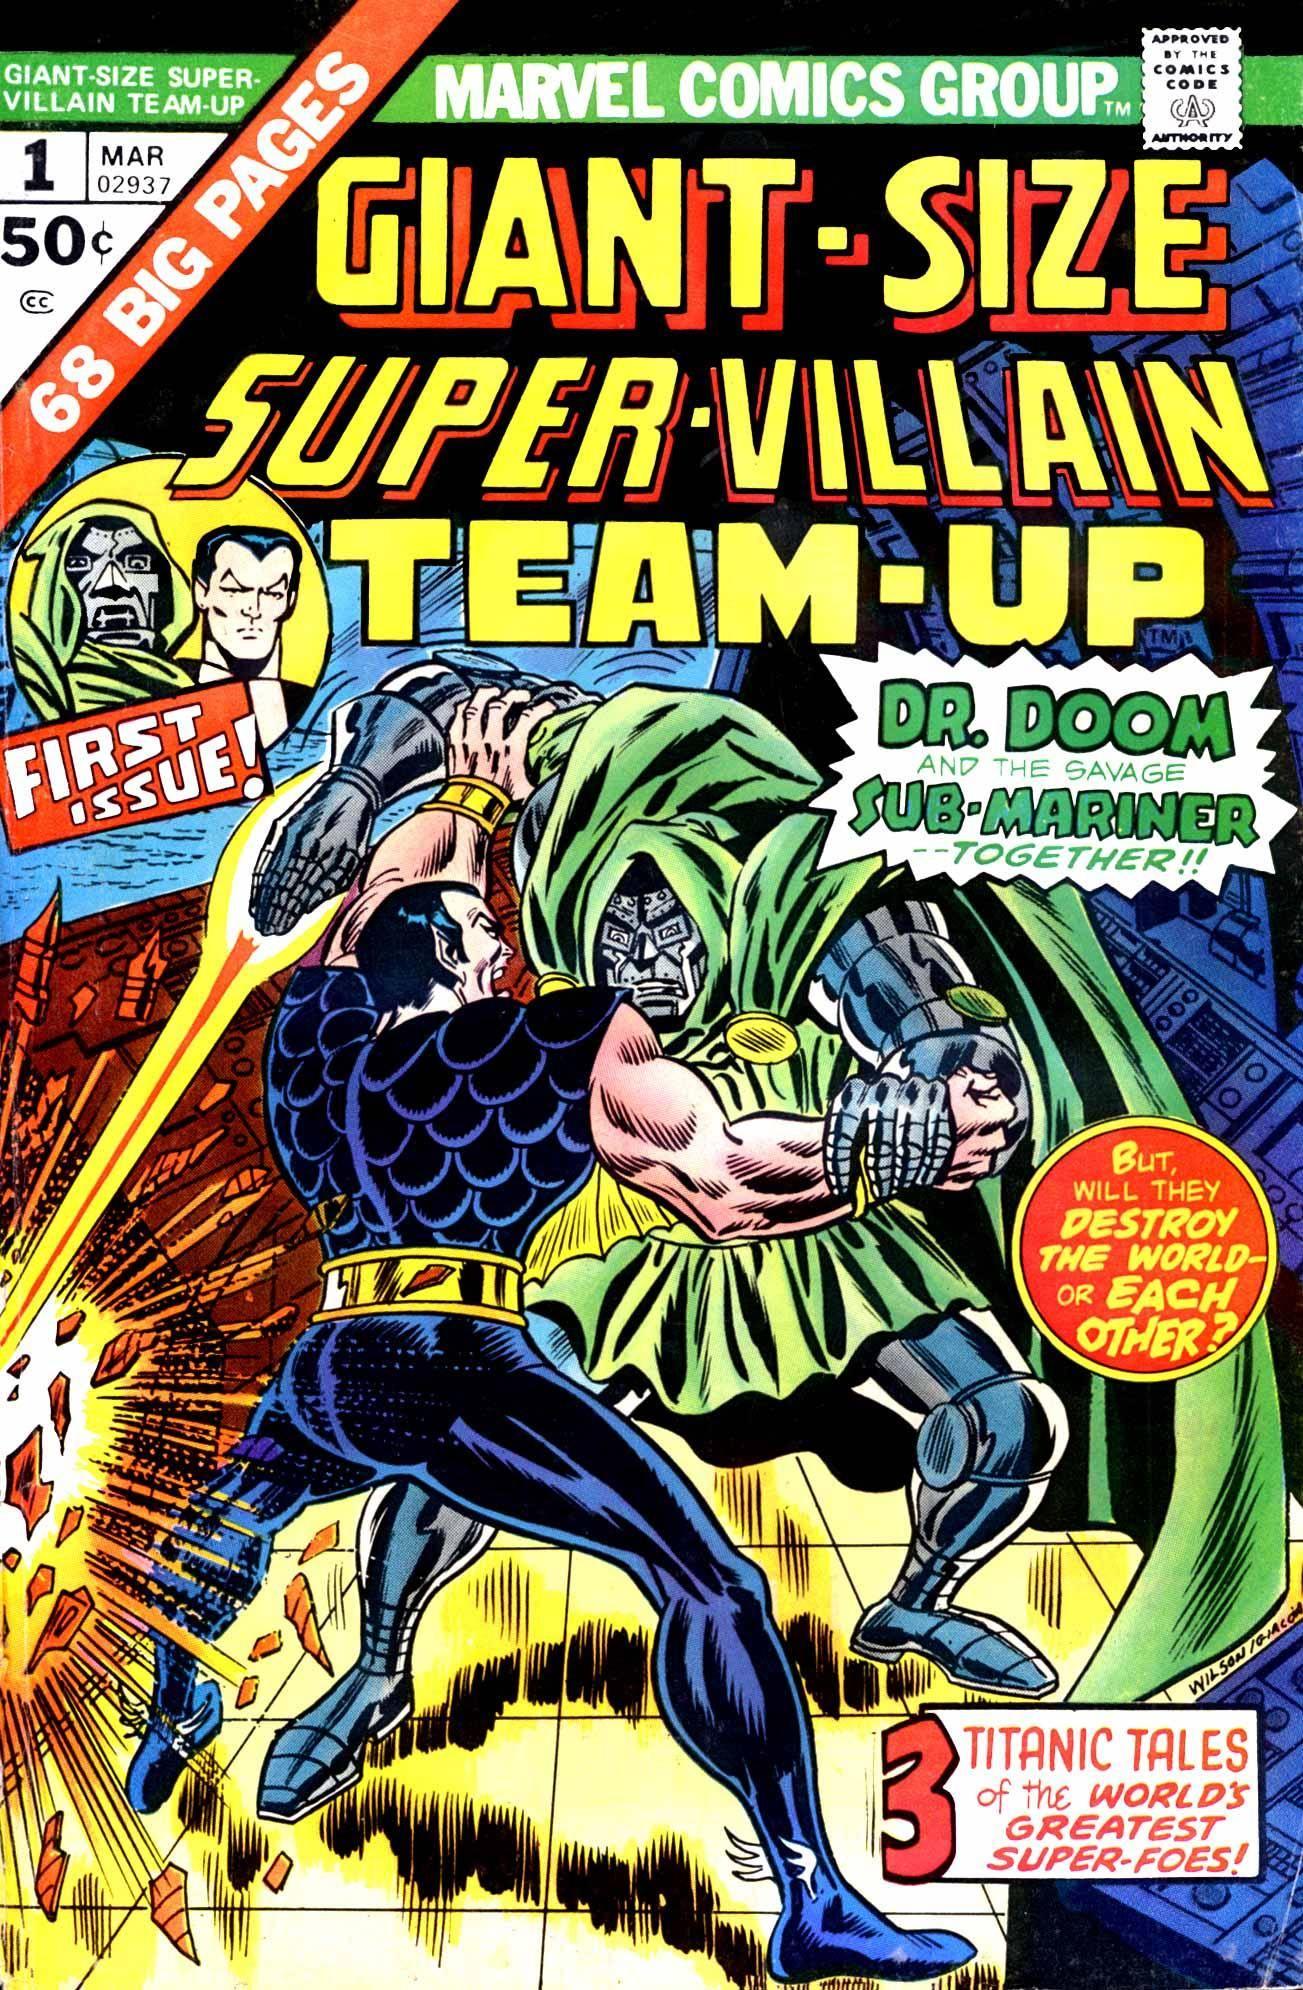 Giant Size Super-Villain Team-Up 001